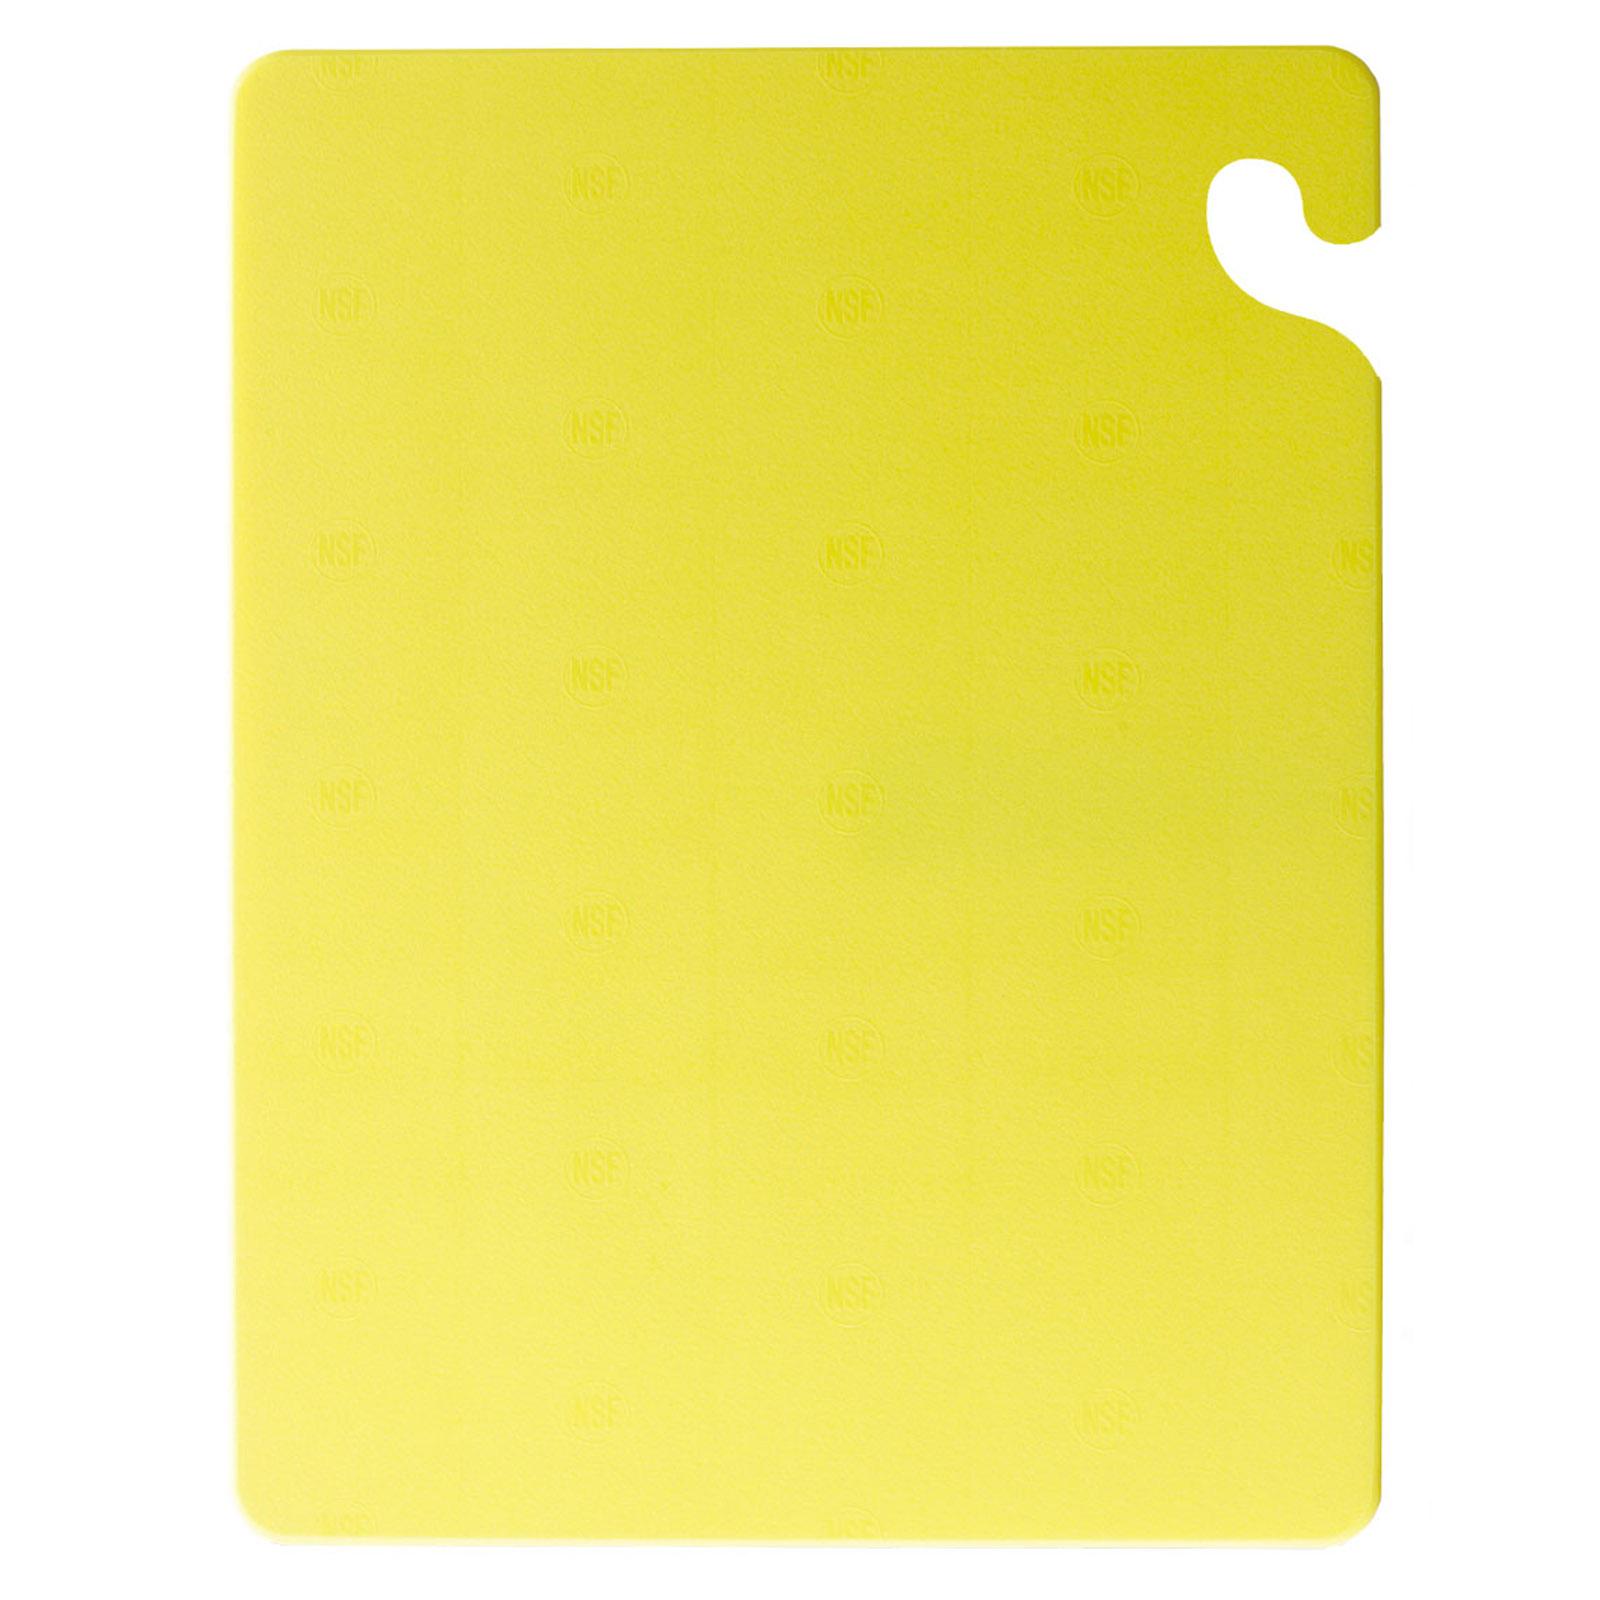 San Jamar CB121812YL cutting board, plastic